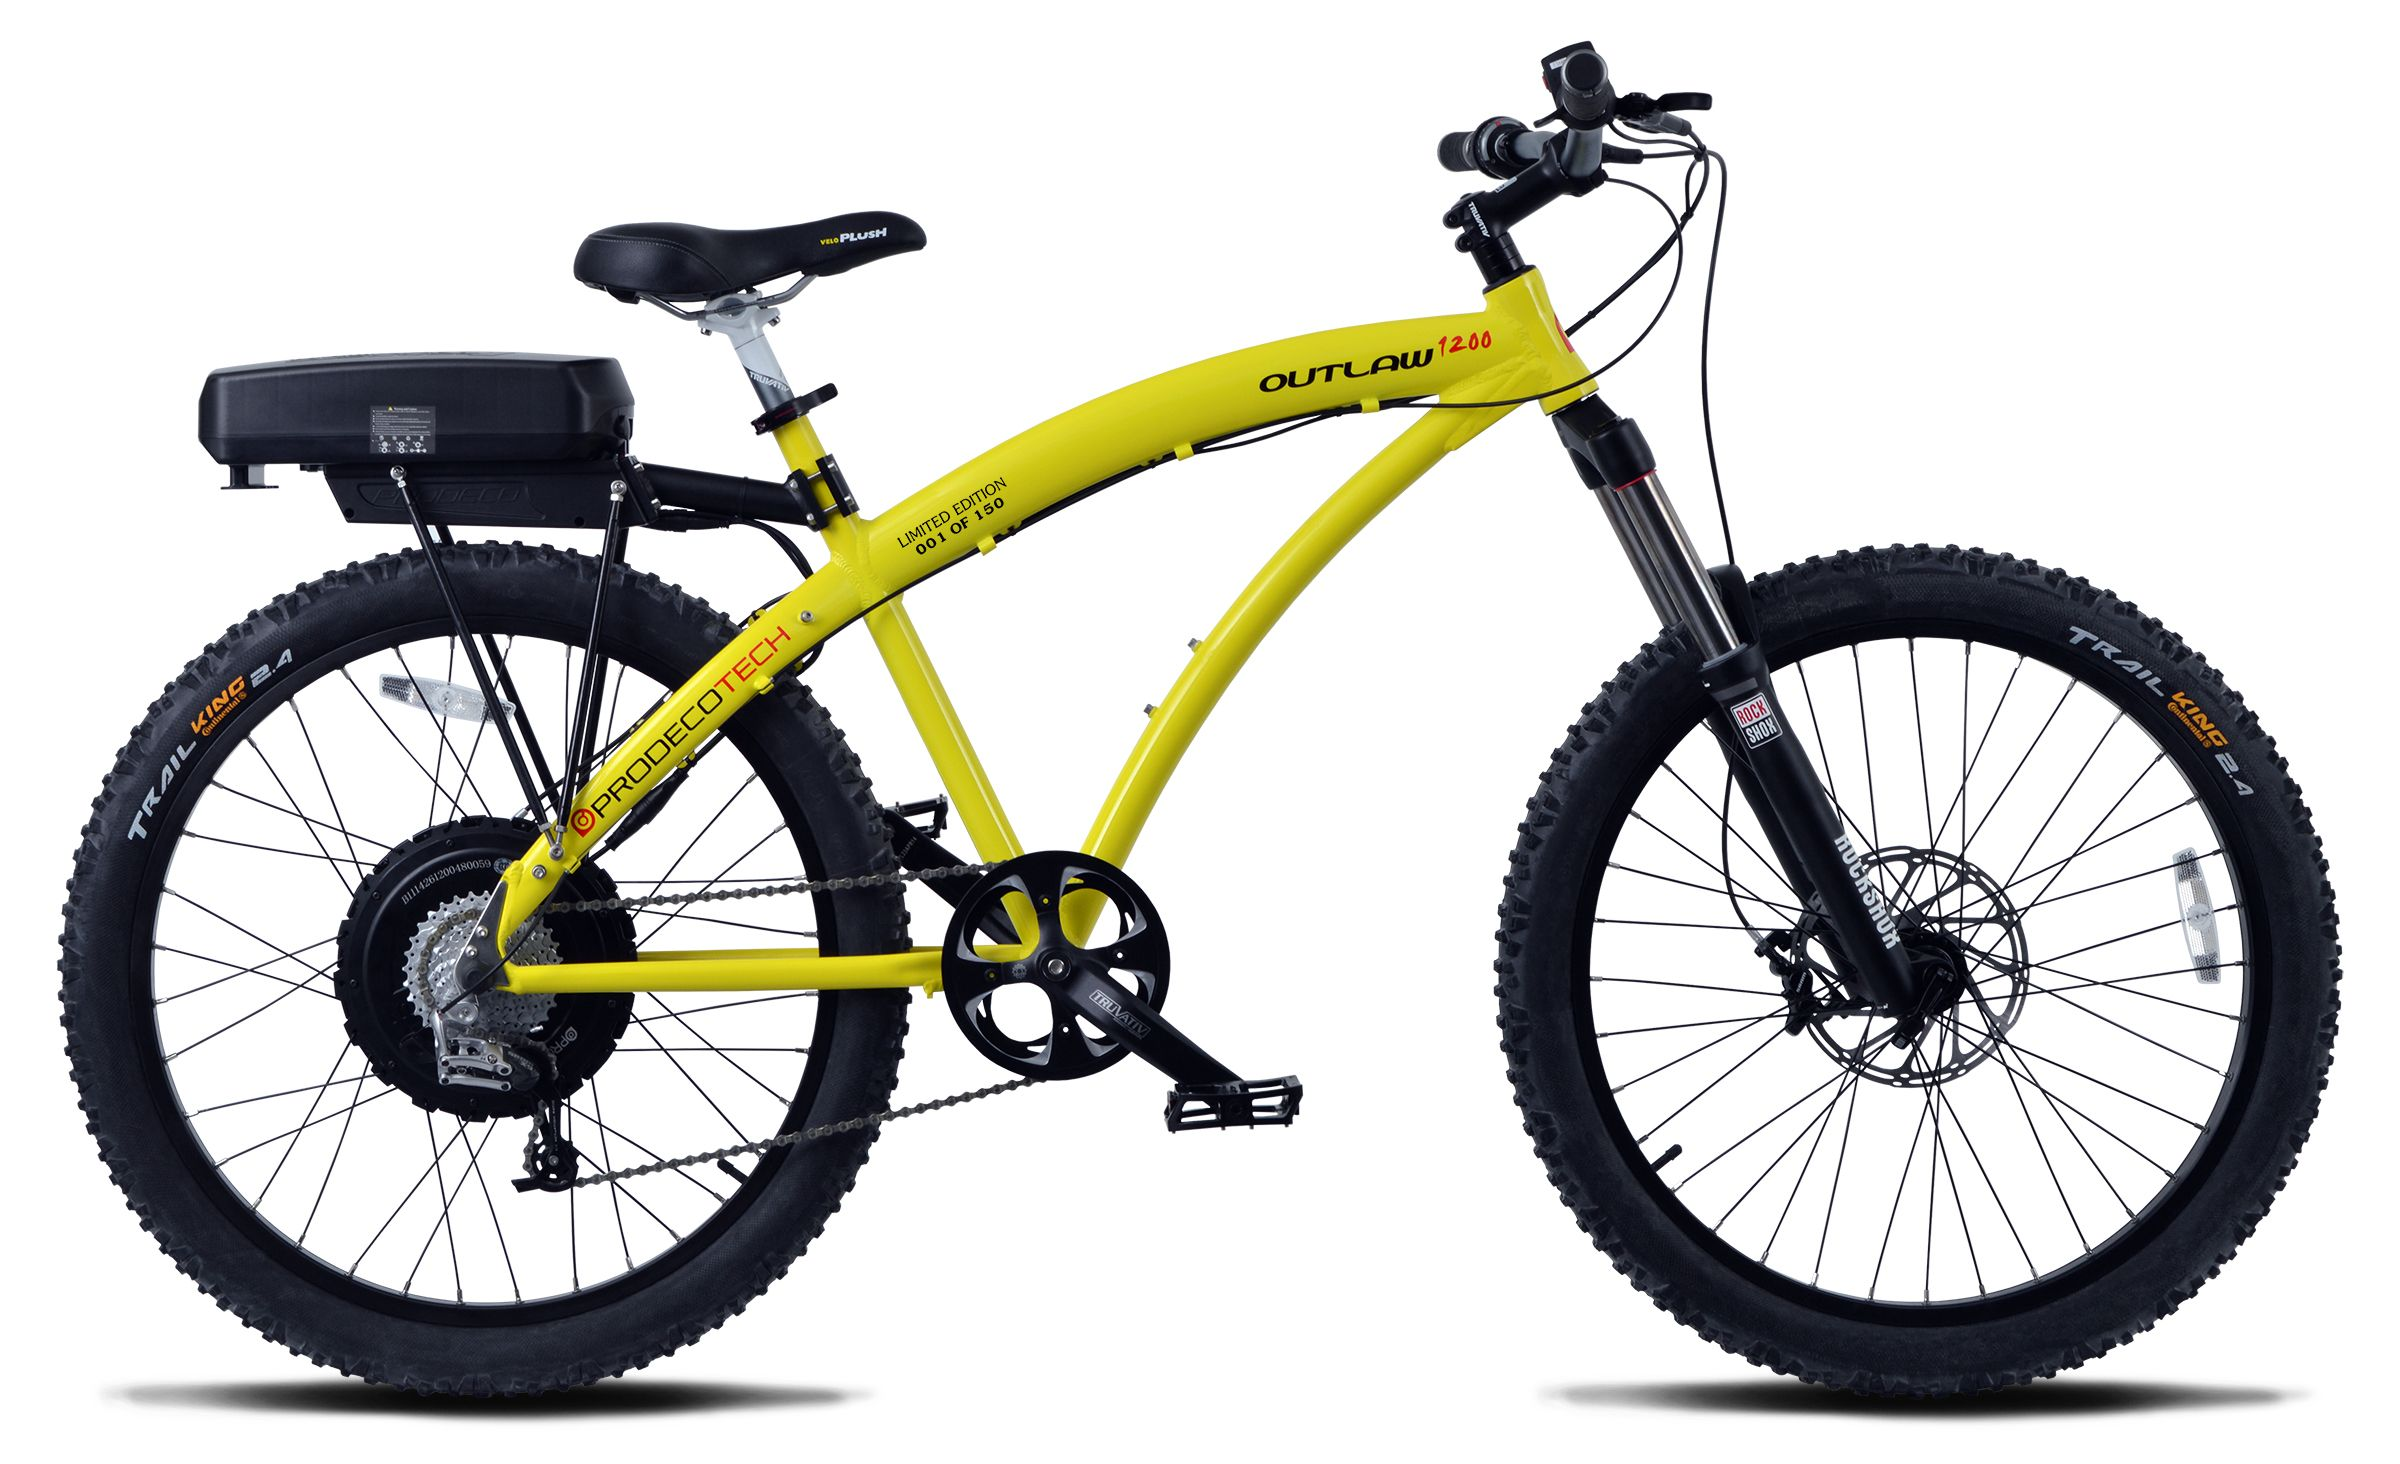 New Prodeco 1200 Watt Special Edition Off Road E Bike Electric Bike Electric Bicycle Bicycle